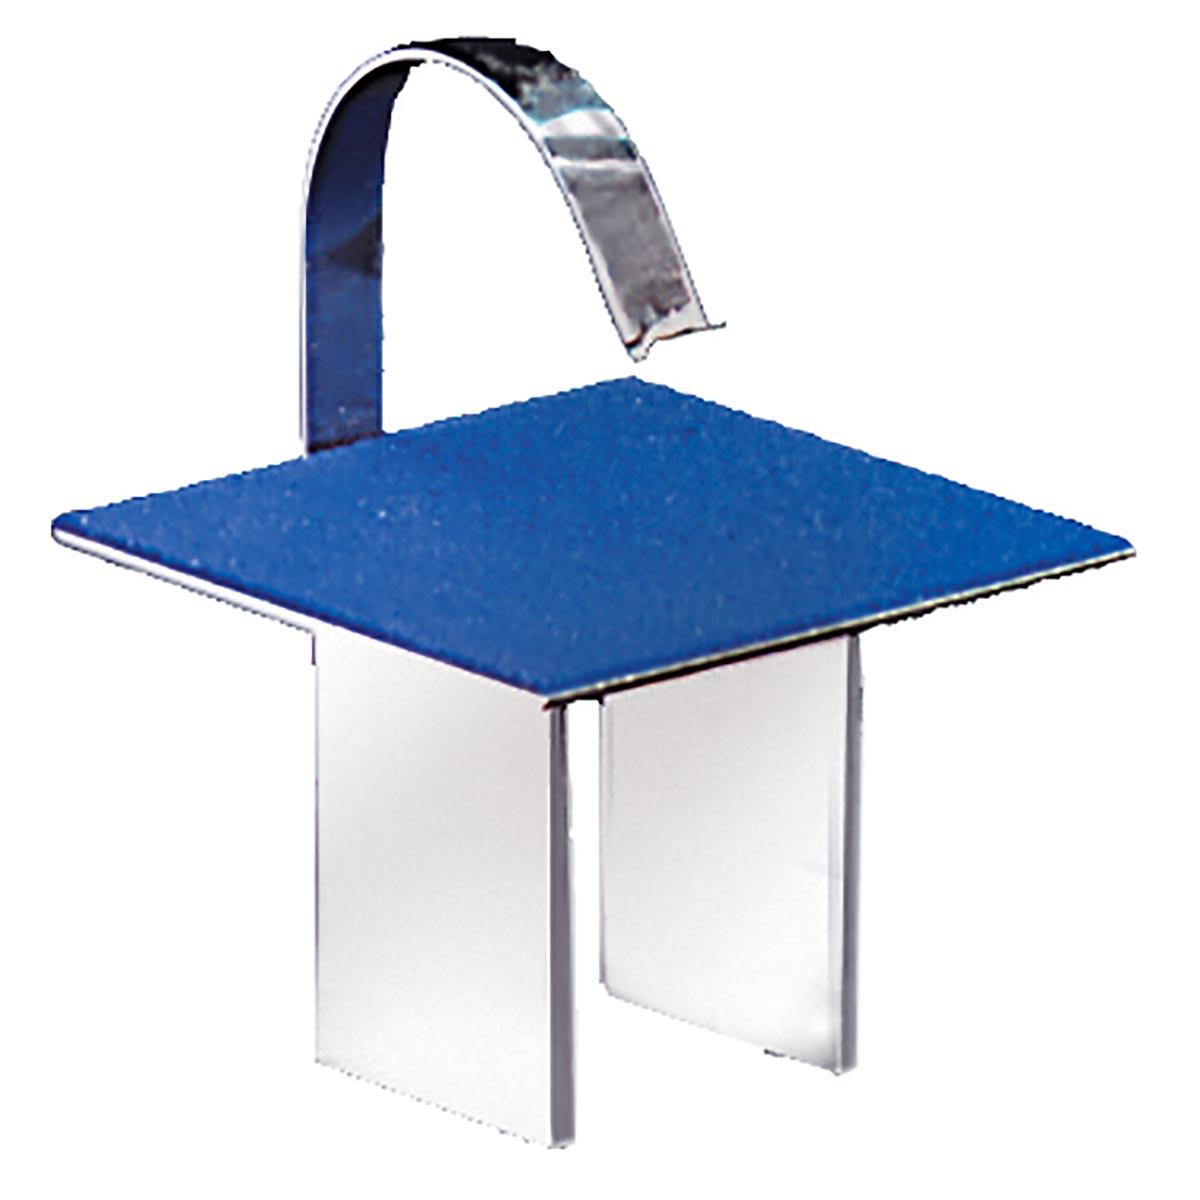 prism table k u8476110 kr 246 ncke optics 3b scientific prism coffee table coffee tables interiors online